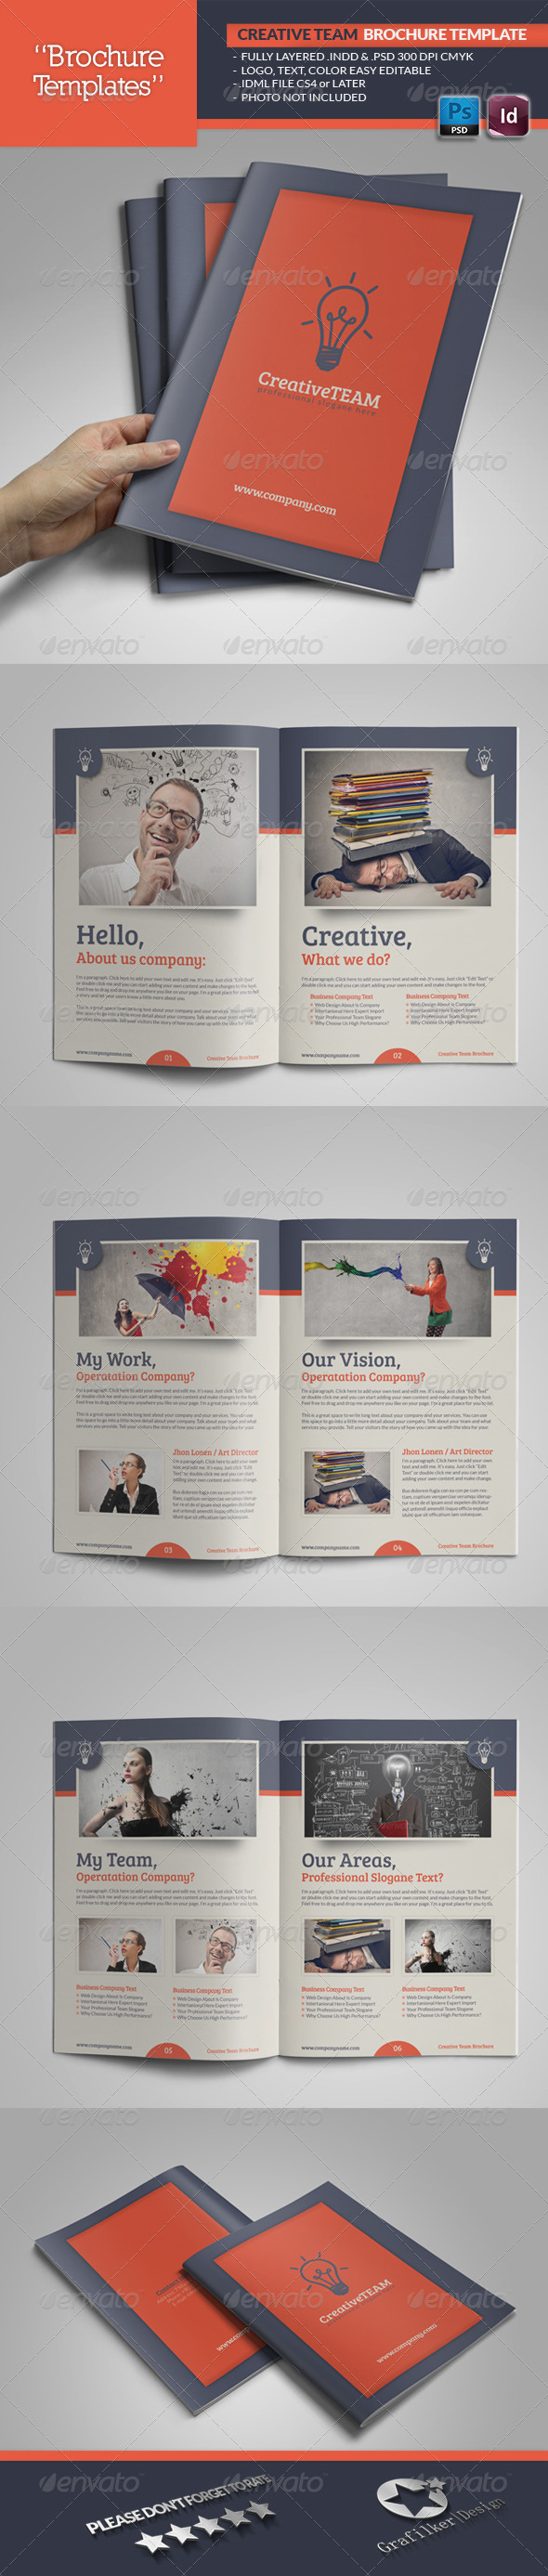 GraphicRiver Creative Team Brochure Template 5297431